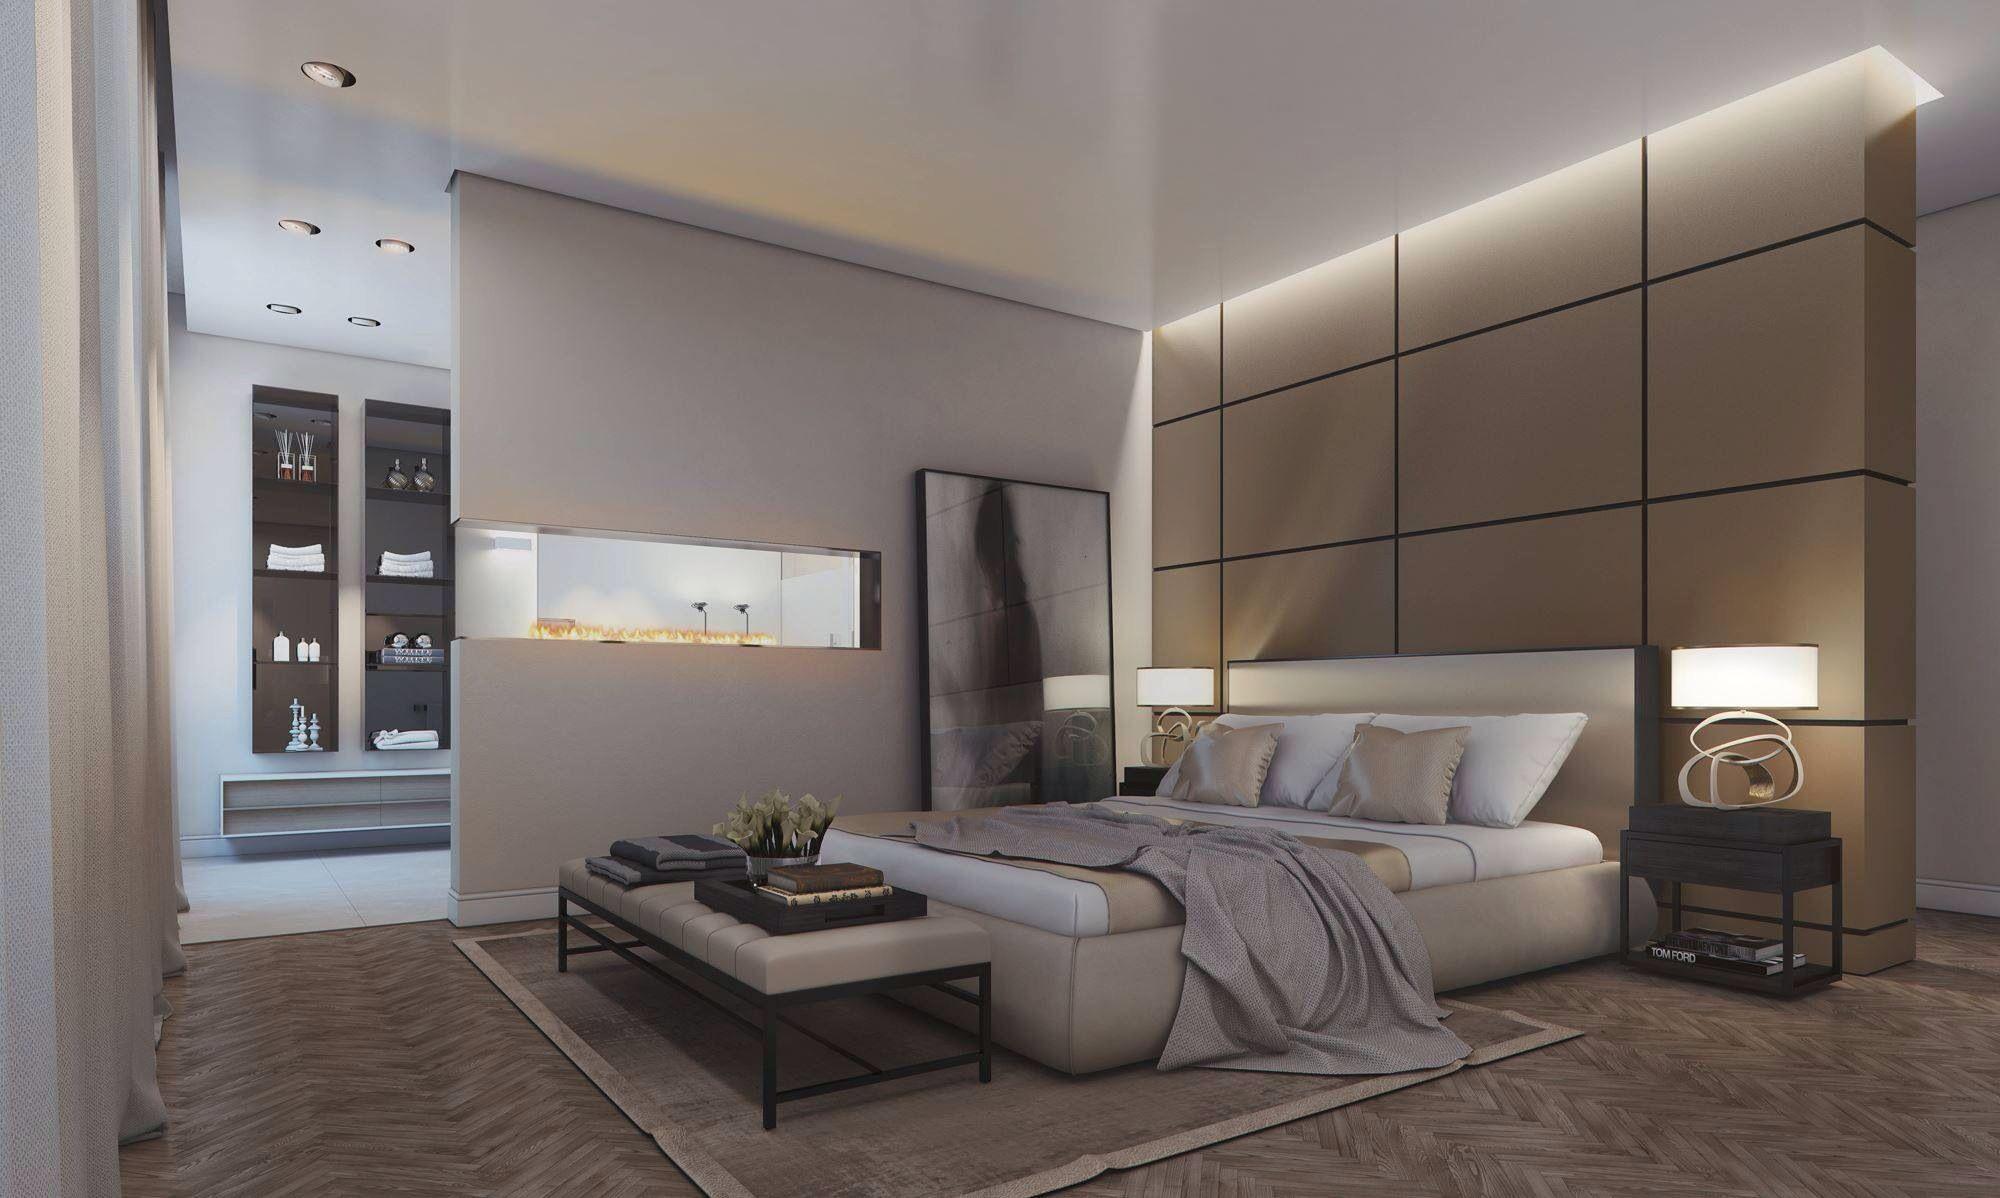 Modern Luxurious Master Suite Luxurious Bedrooms Modern Bedroom Bedroom Interior